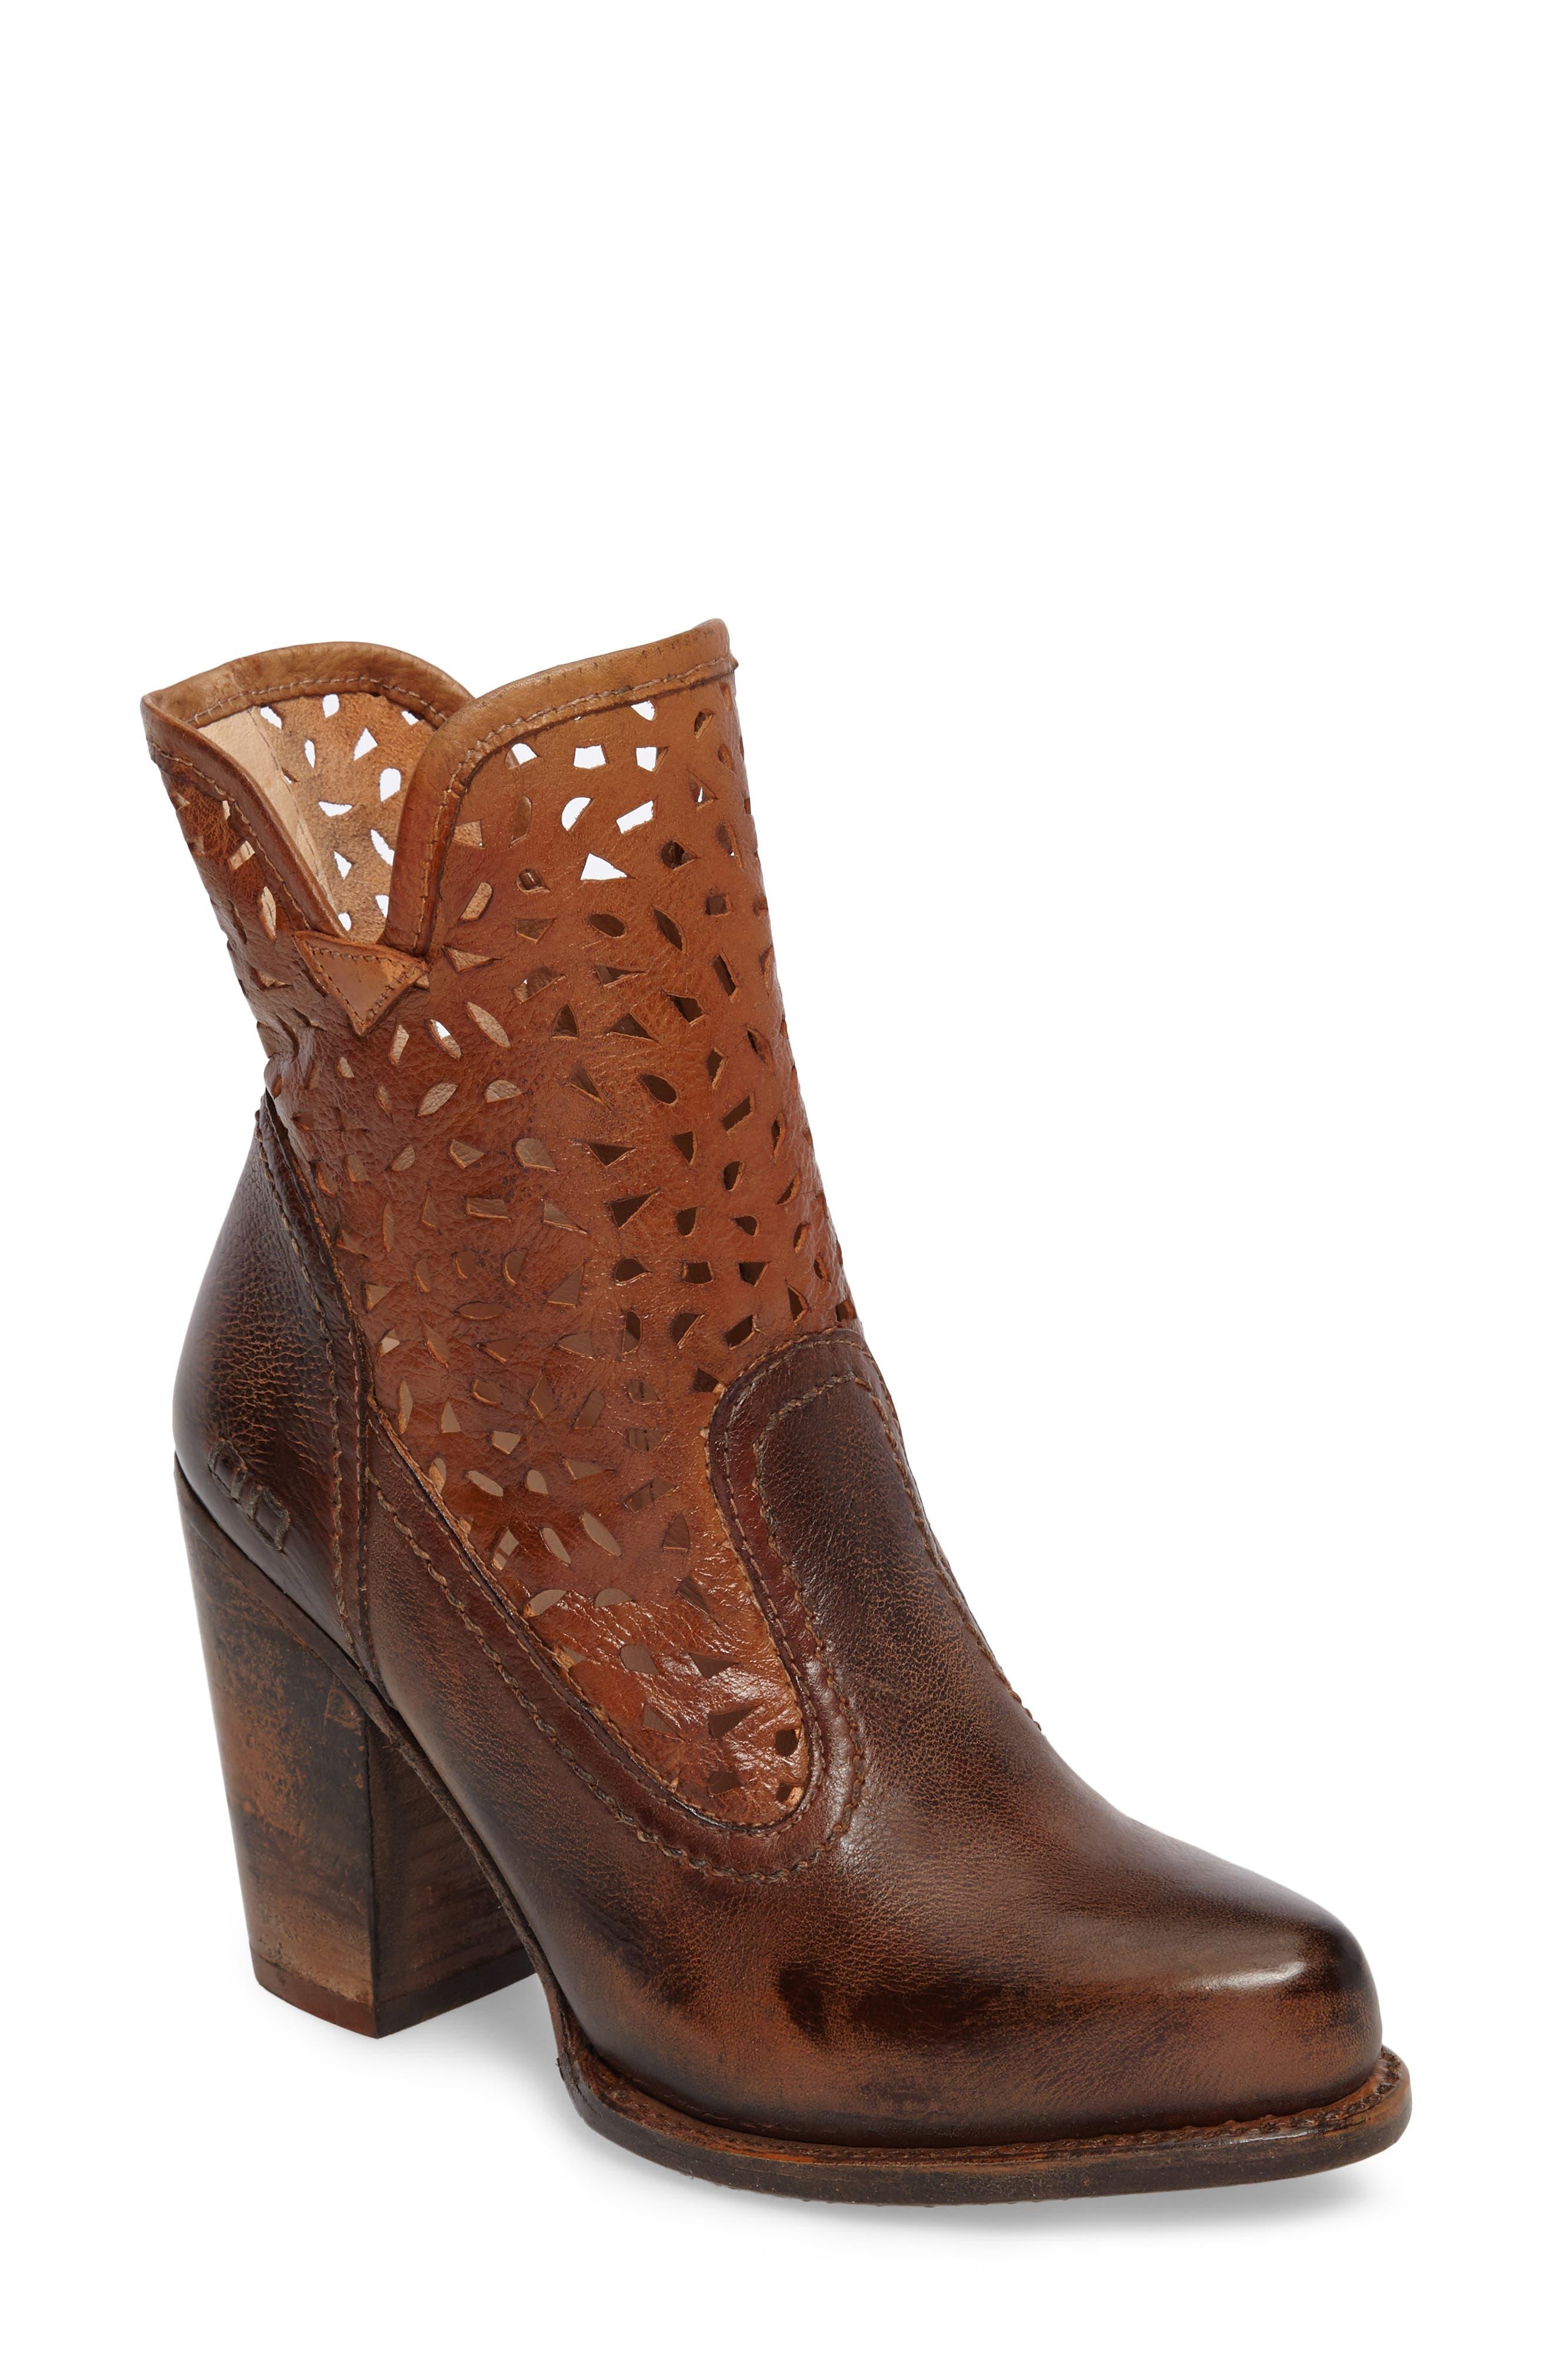 Main Image - Bed Stu Irma Perforated Boot (Women)